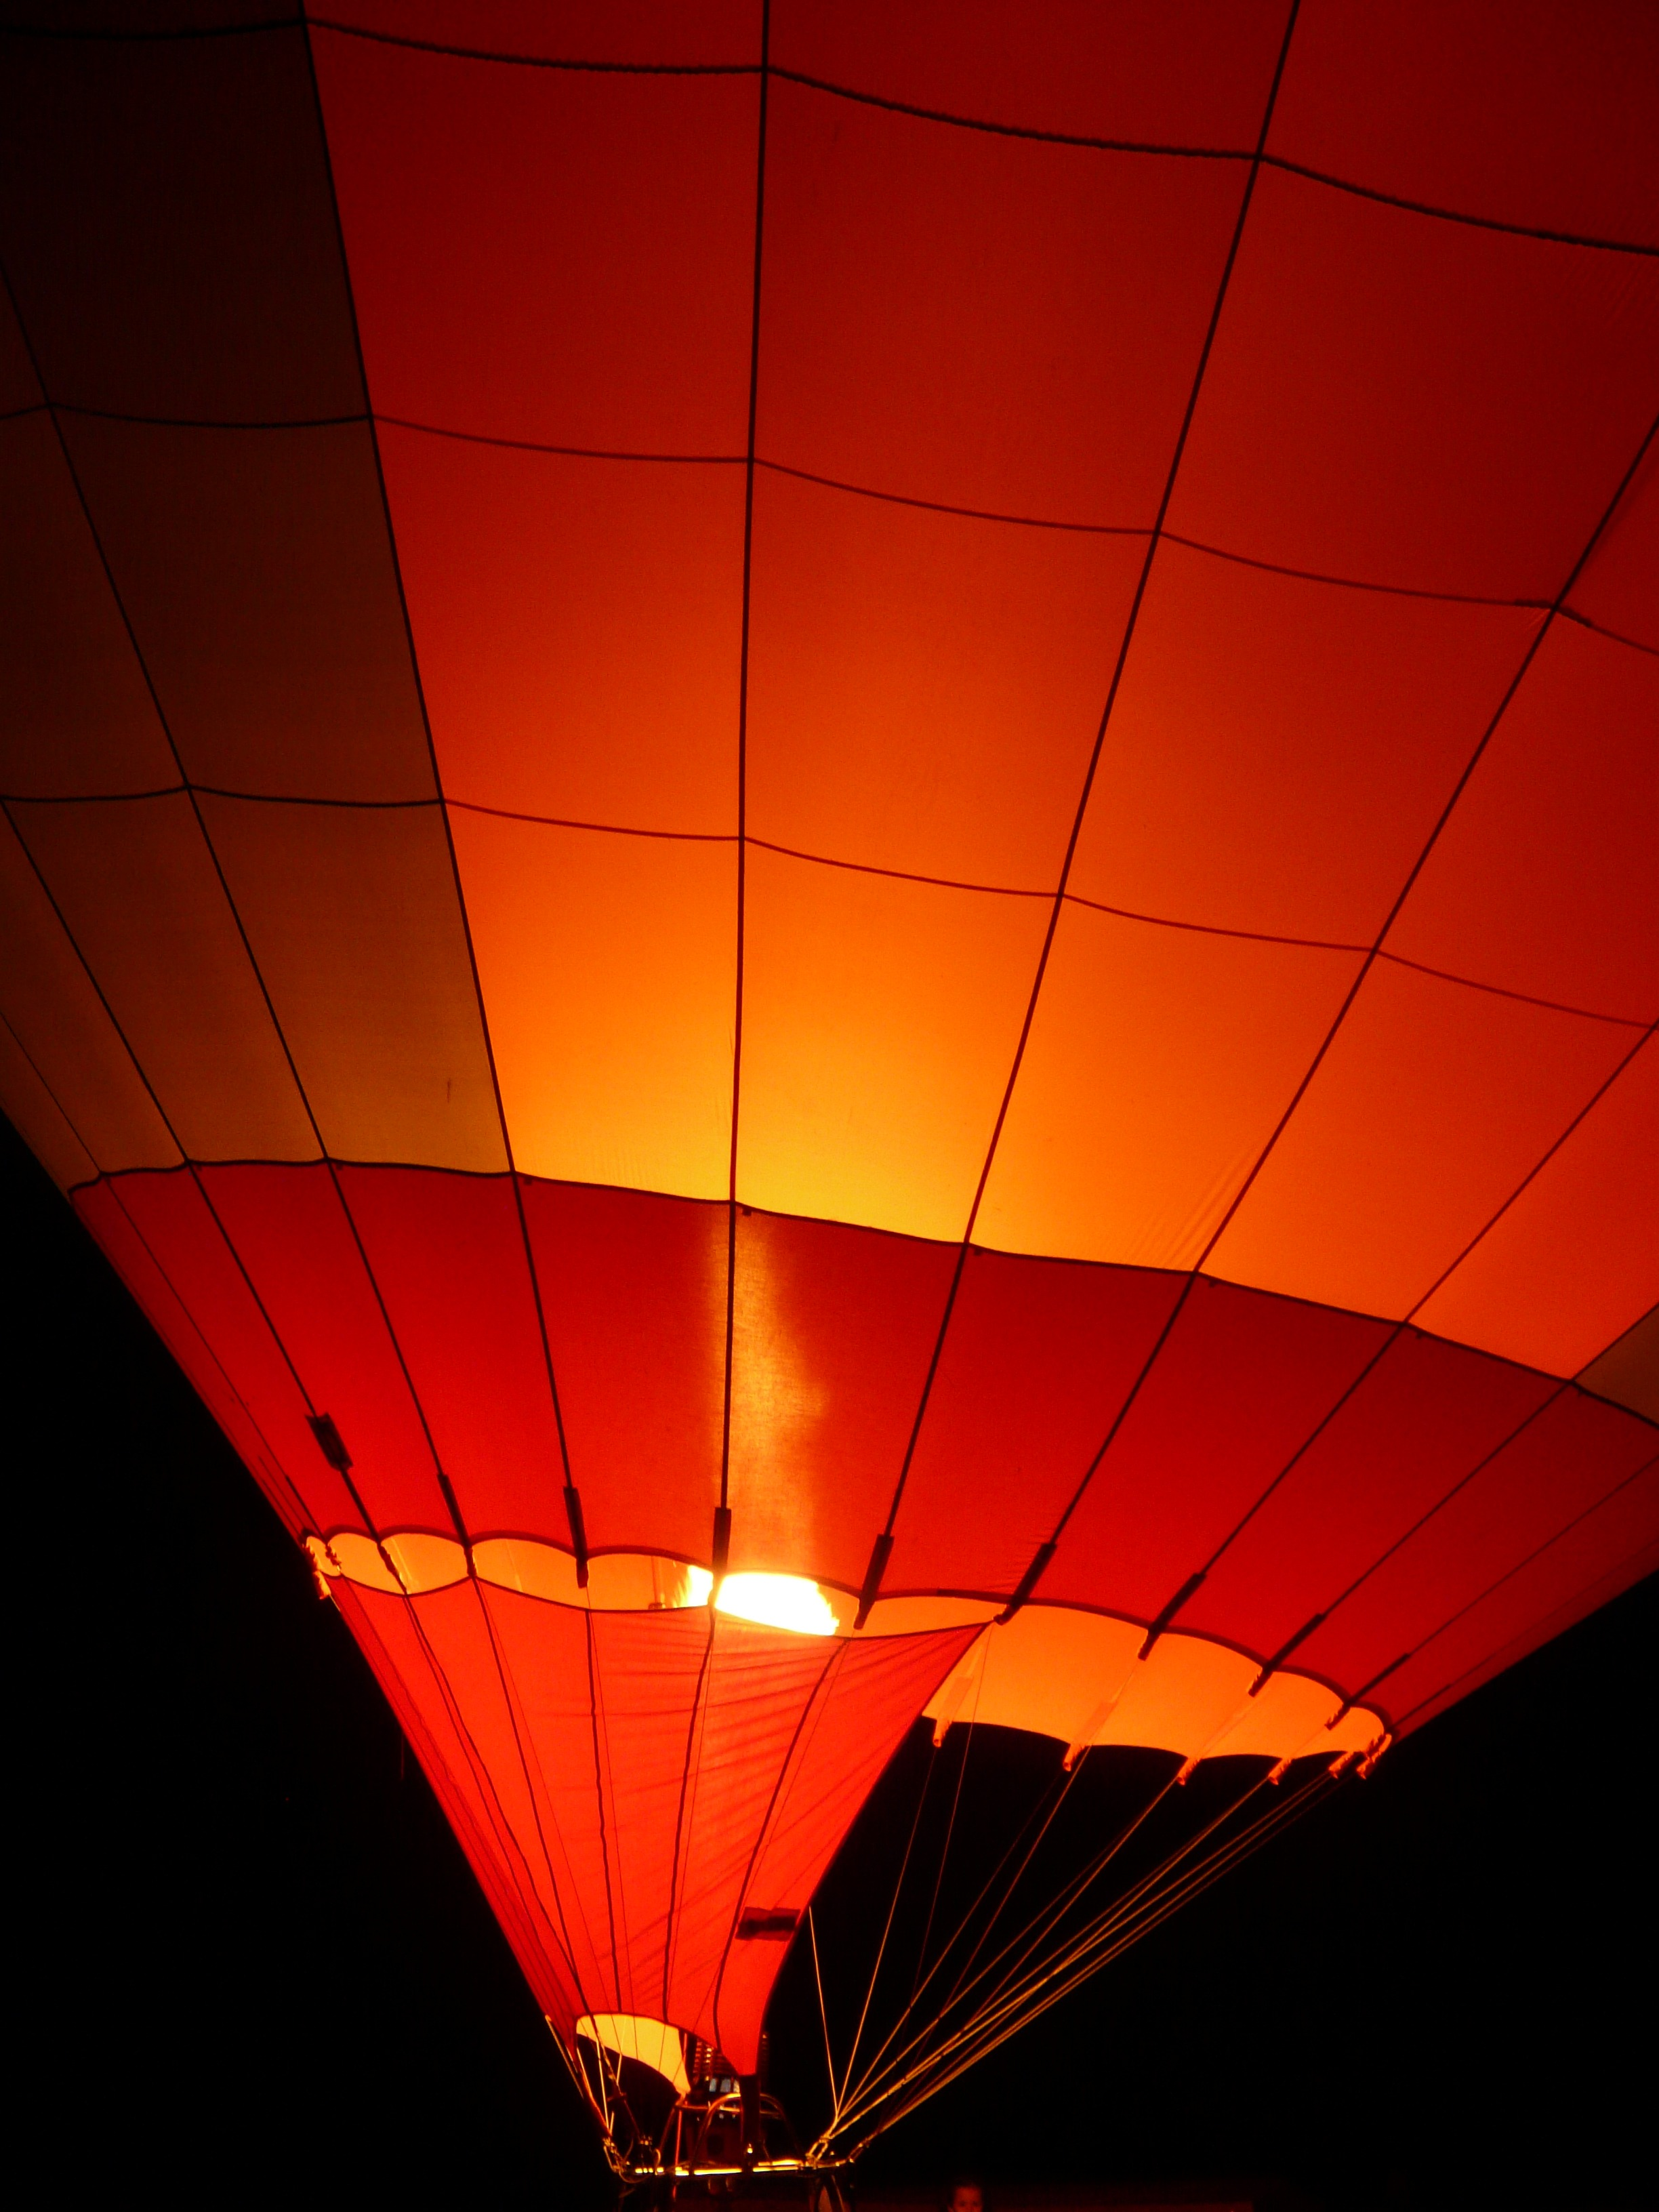 Black Light Wallpaper Red Air Balloon 183 Free Stock Photo